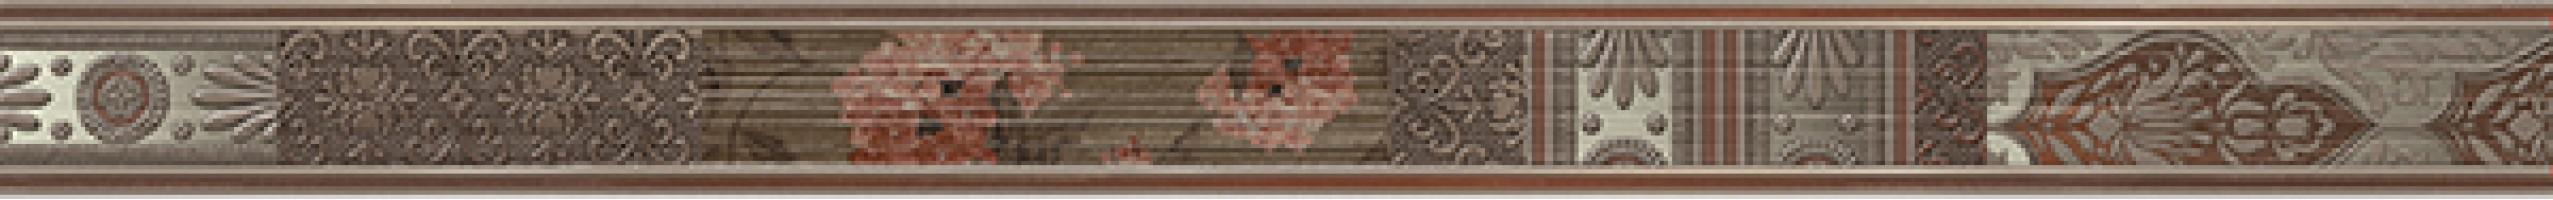 Бордюр Keraben Velvet Listelo Patchwork Marron 7x90